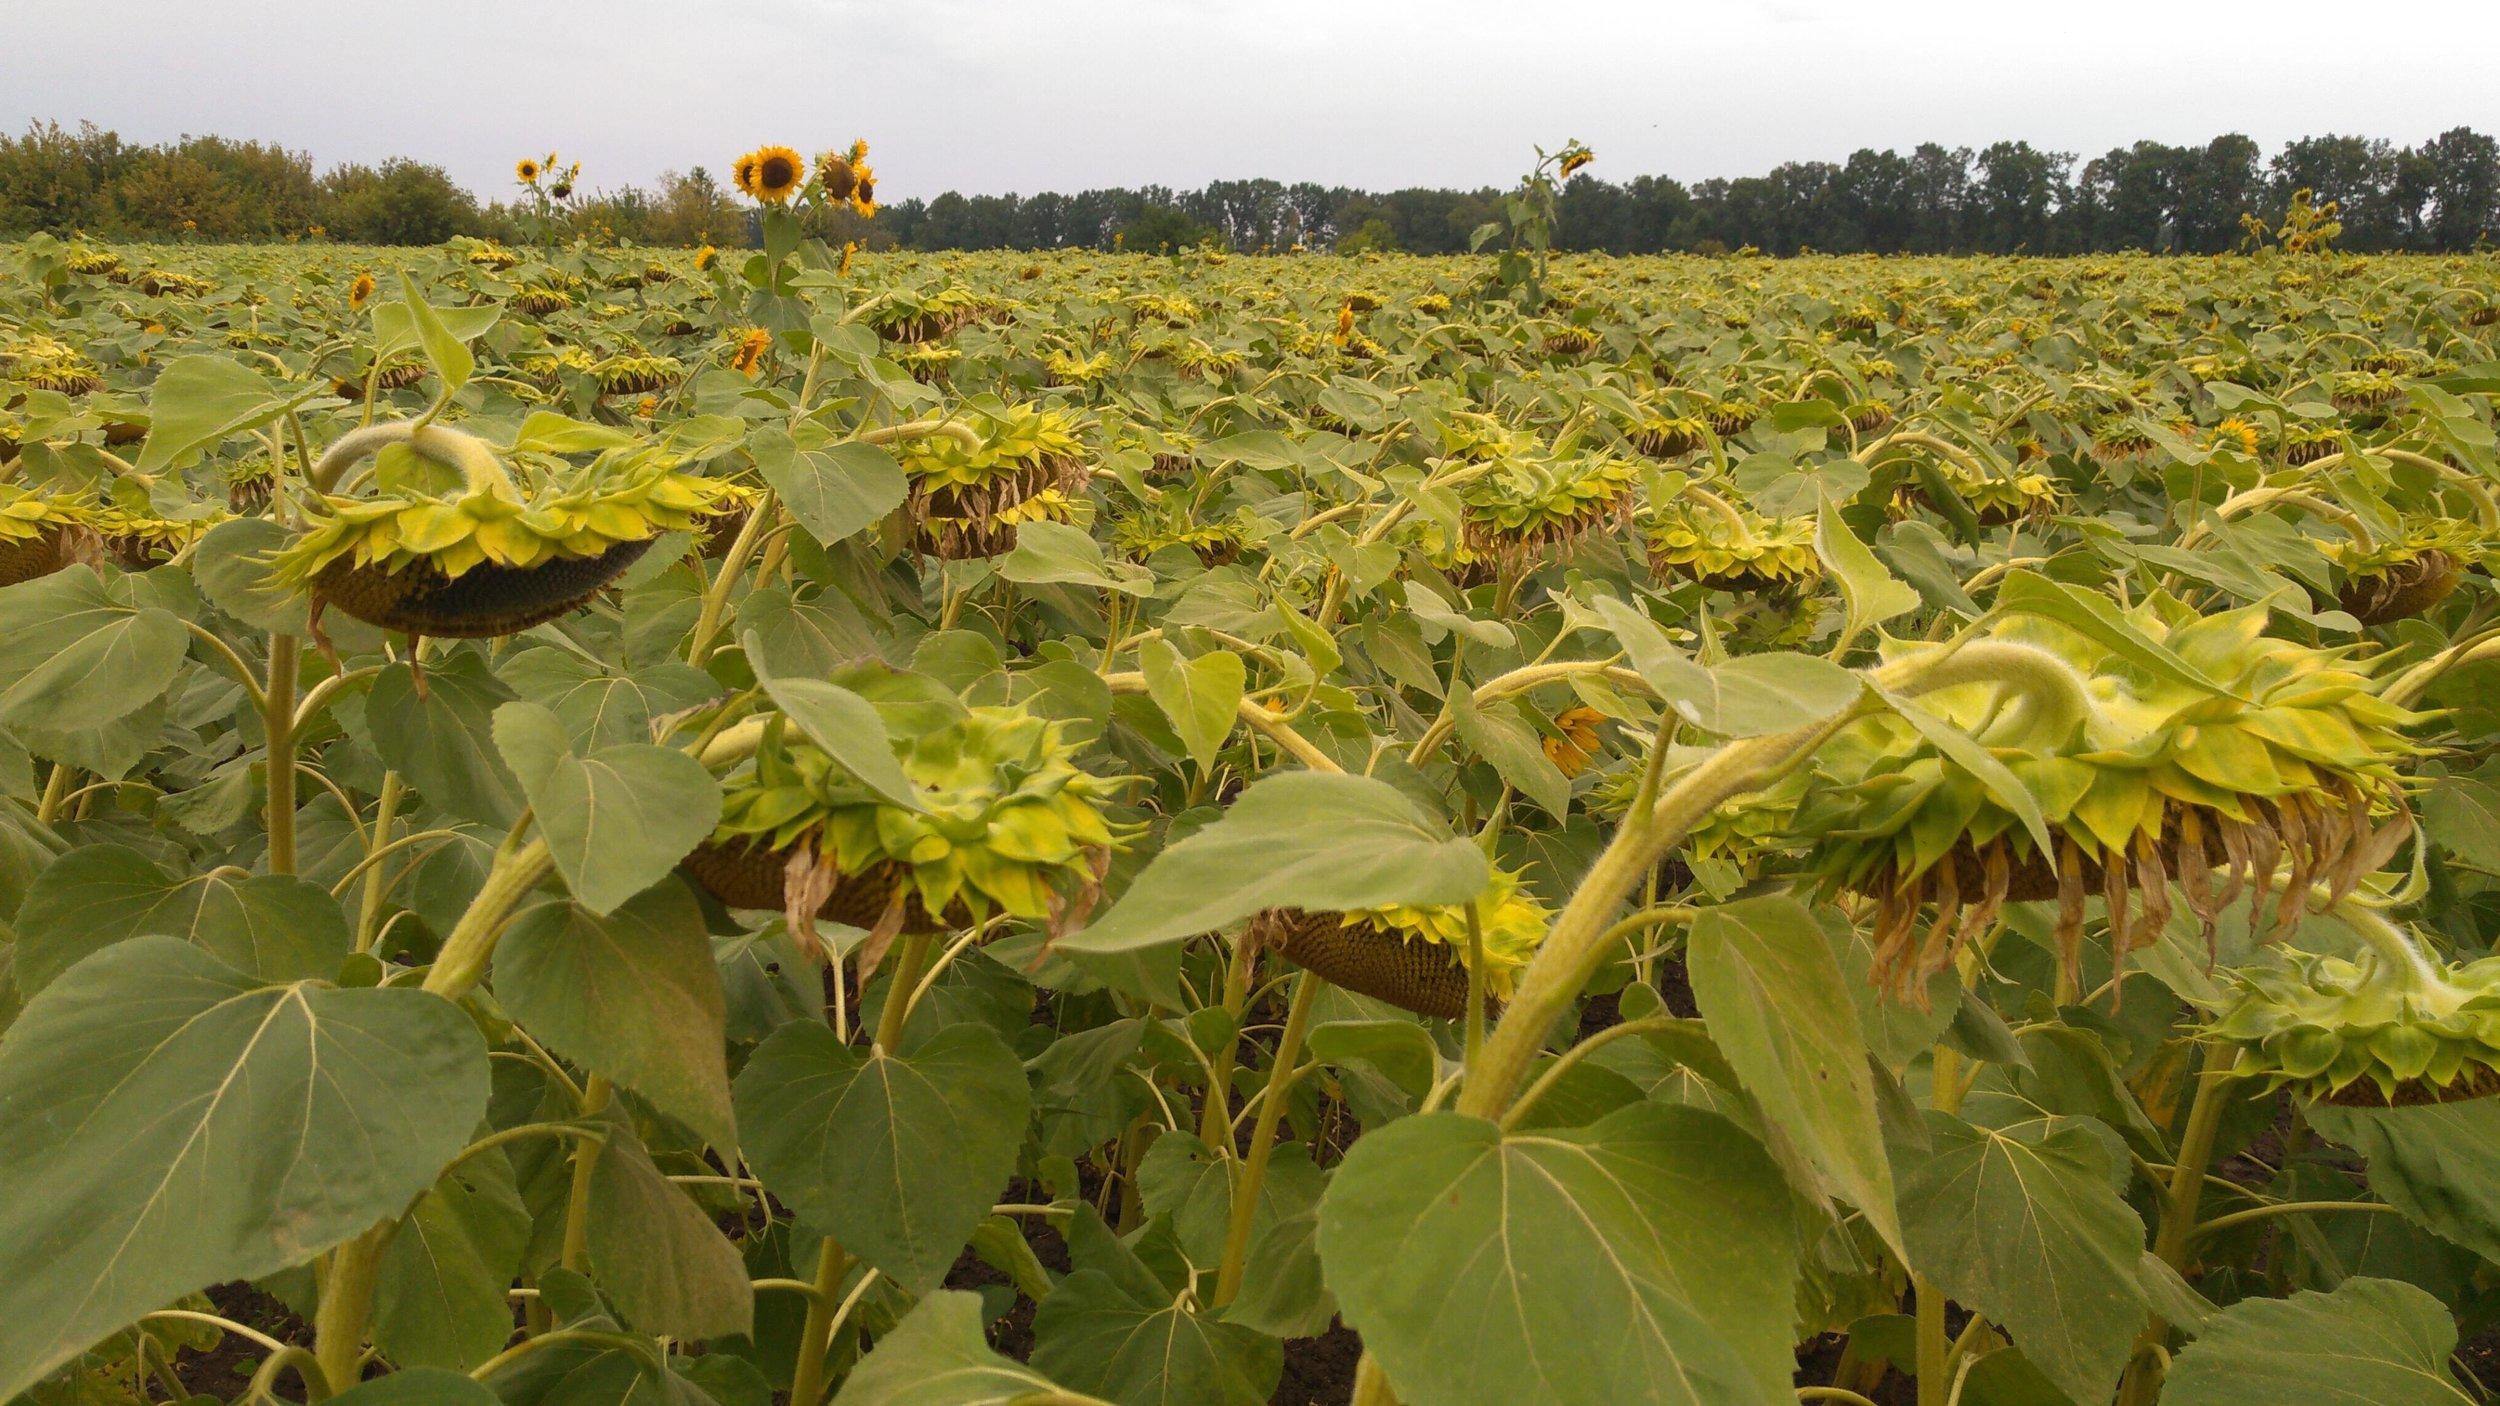 Sunflower field approaching harvesting in the Poltava region